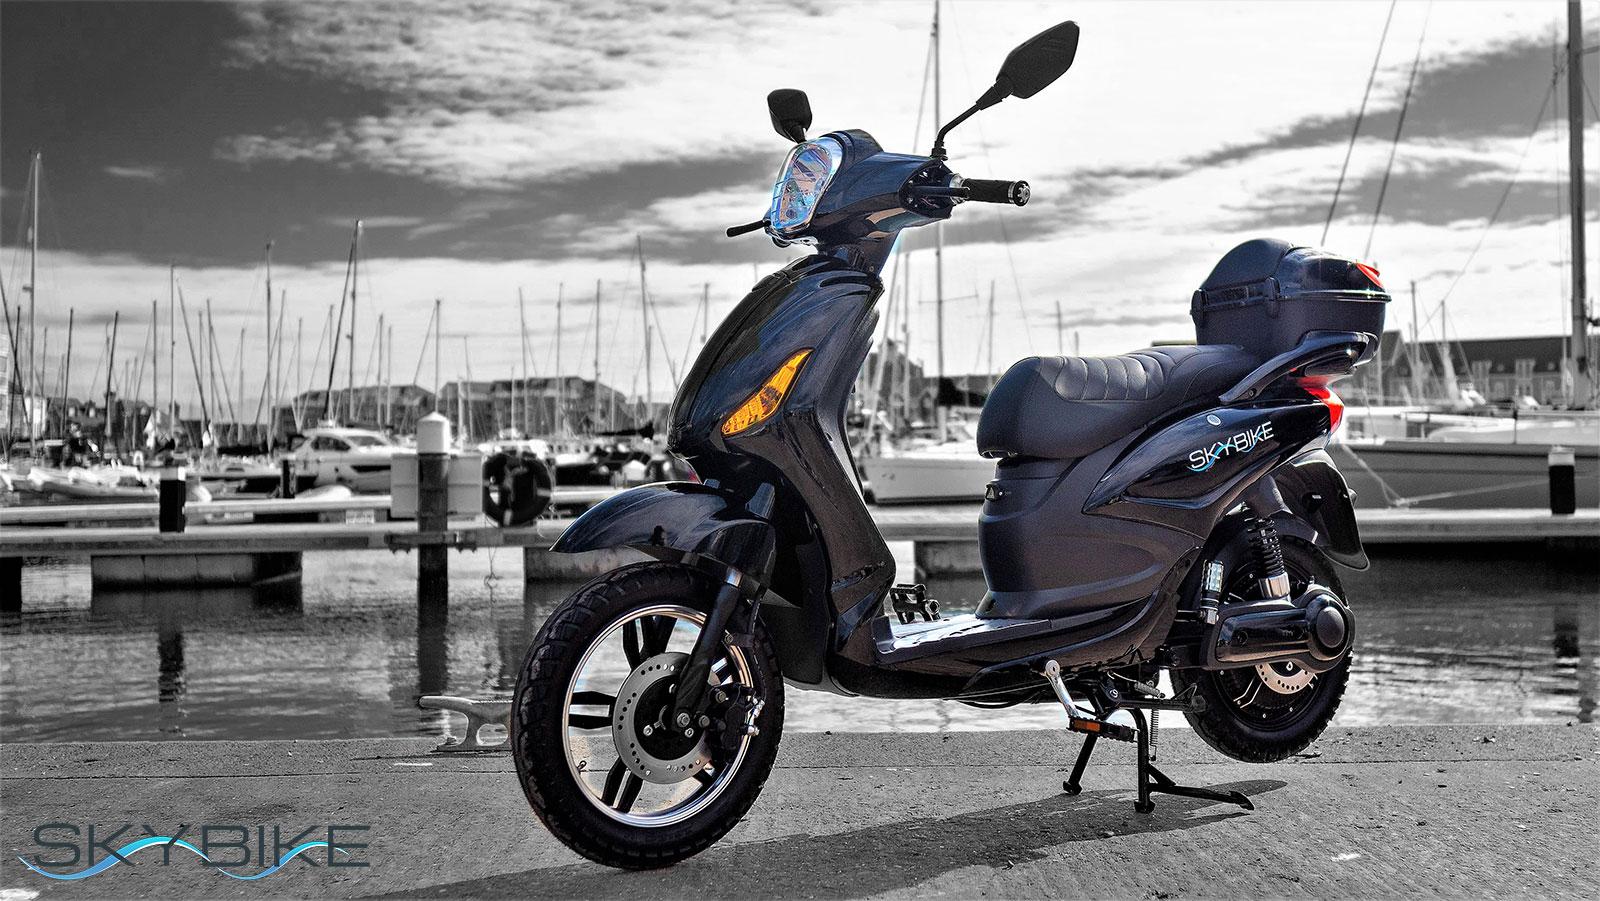 Skybike-Black